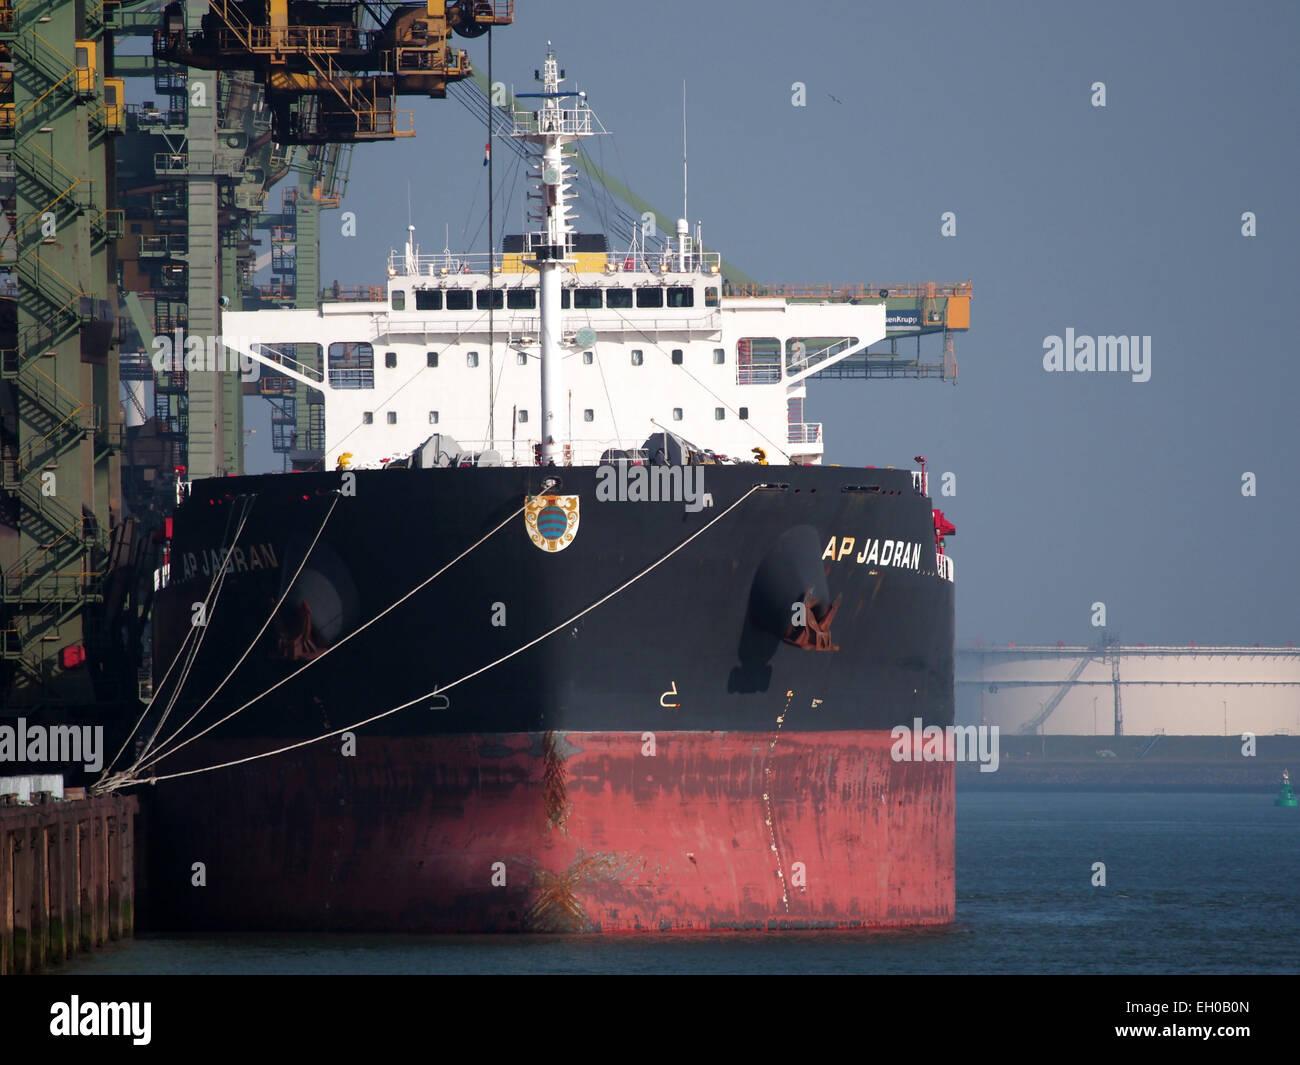 AP Jadran - IMO 9511246, Mississippihaven, Port of Rotterdam pic4 - Stock Image